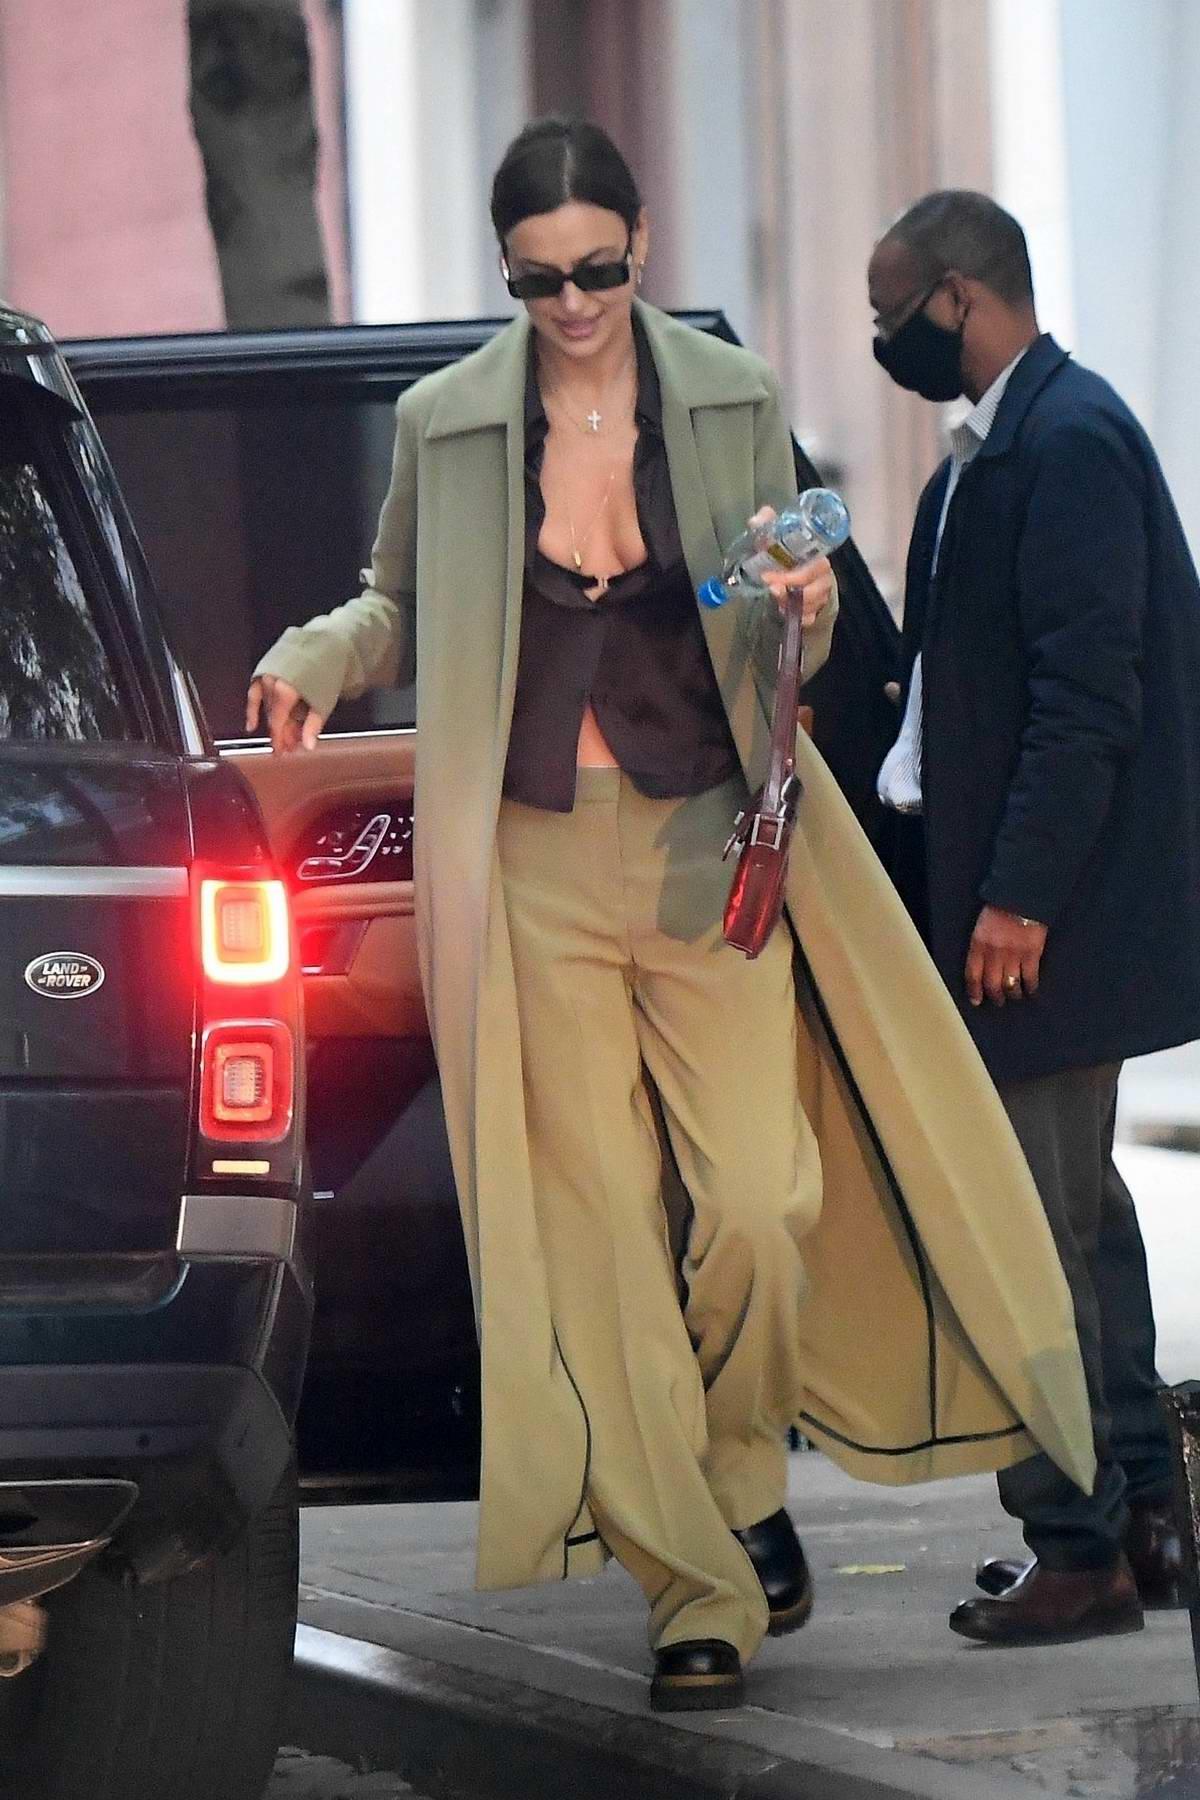 Irina Shayk looks stylish while she hops into Vito Schnabel's Range Rover in New York City